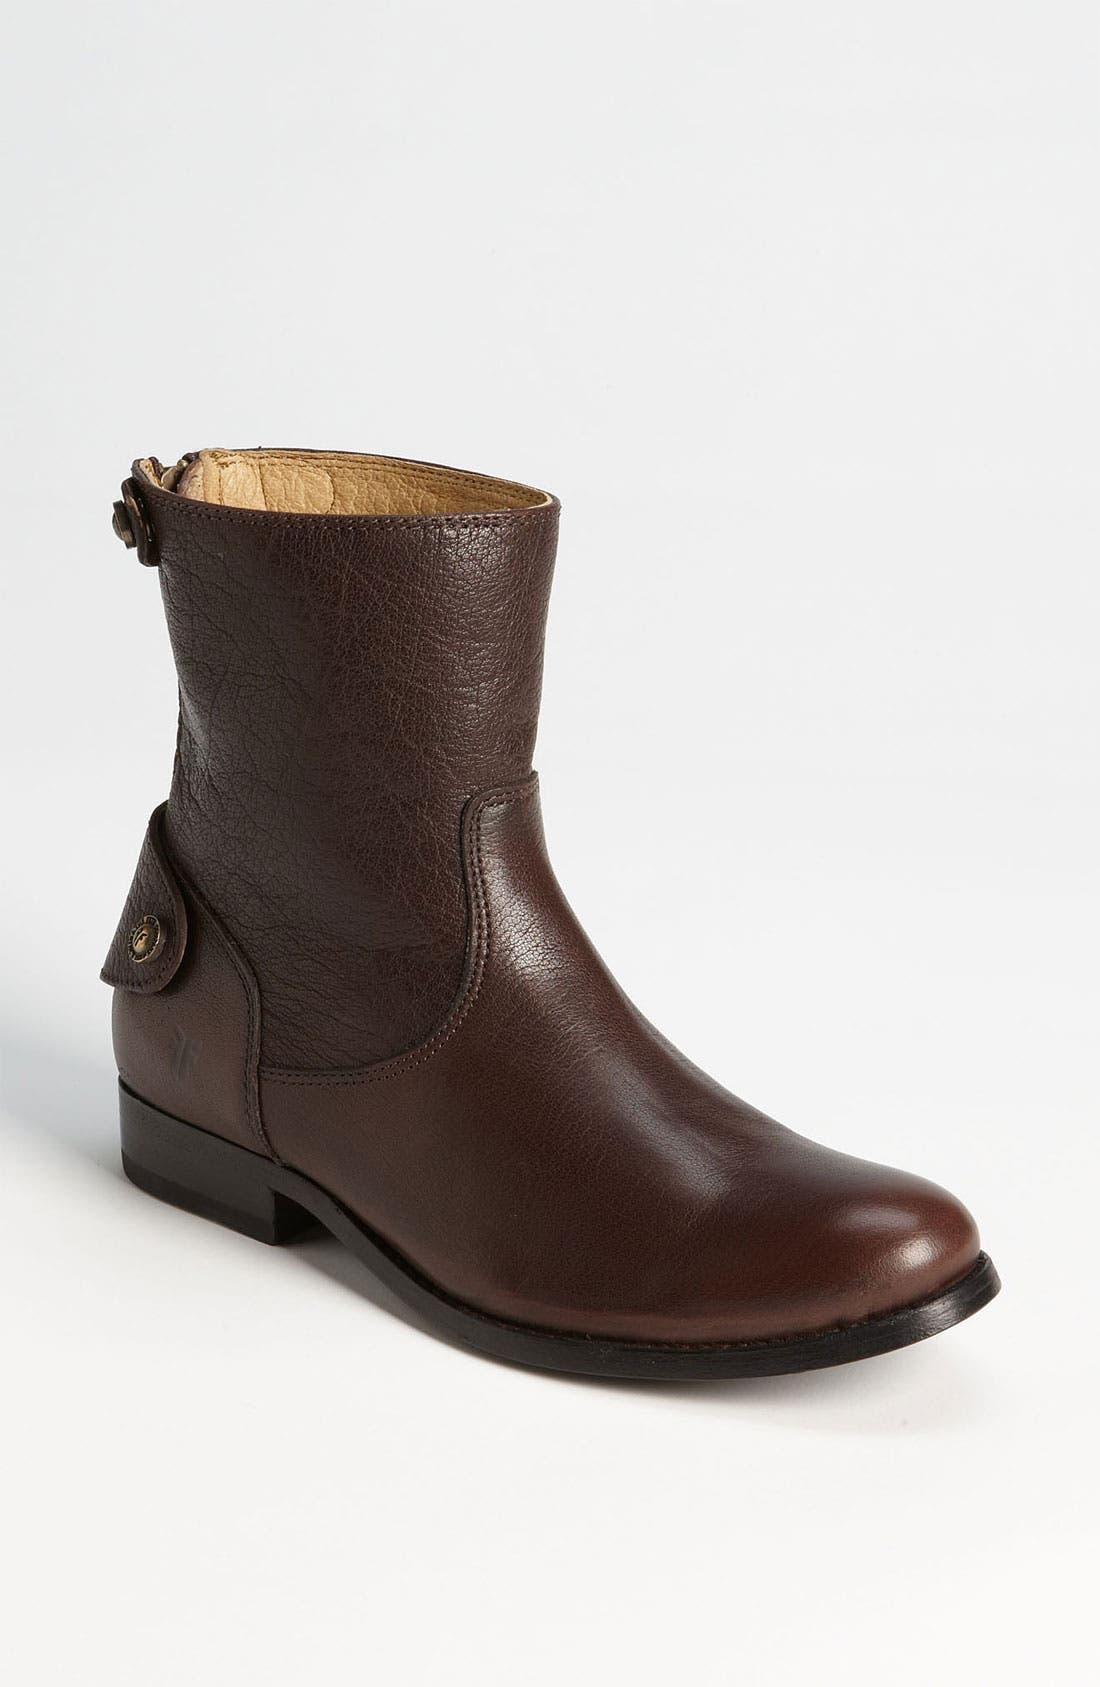 Main Image - Frye 'Button Zip' Short Boot